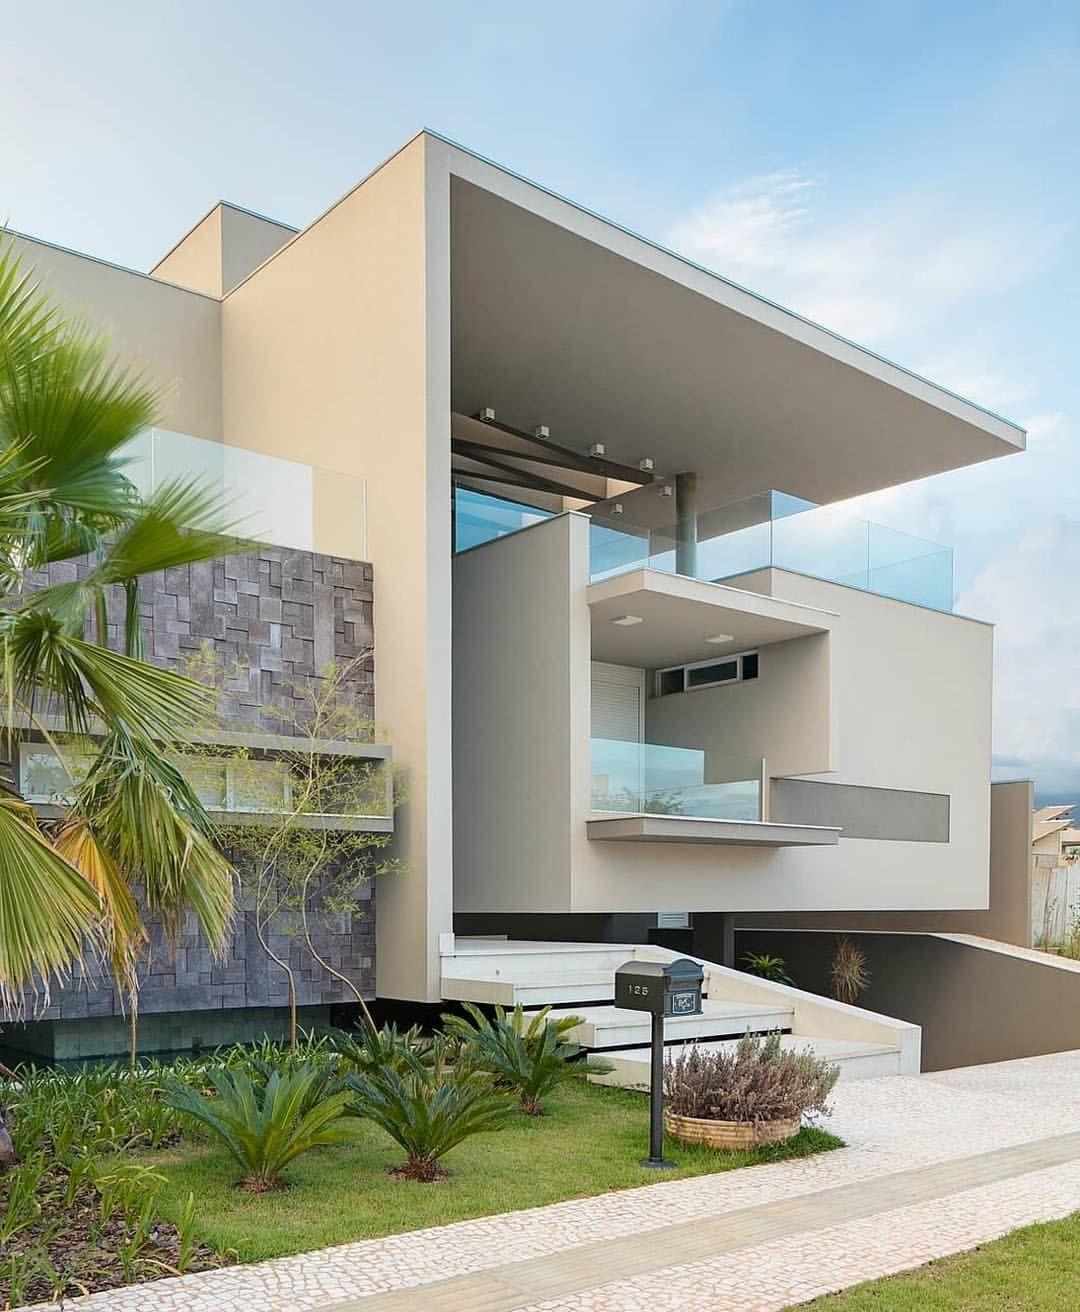 Lorena lima dicadalores en instagram fachada for Casa minimalista lima